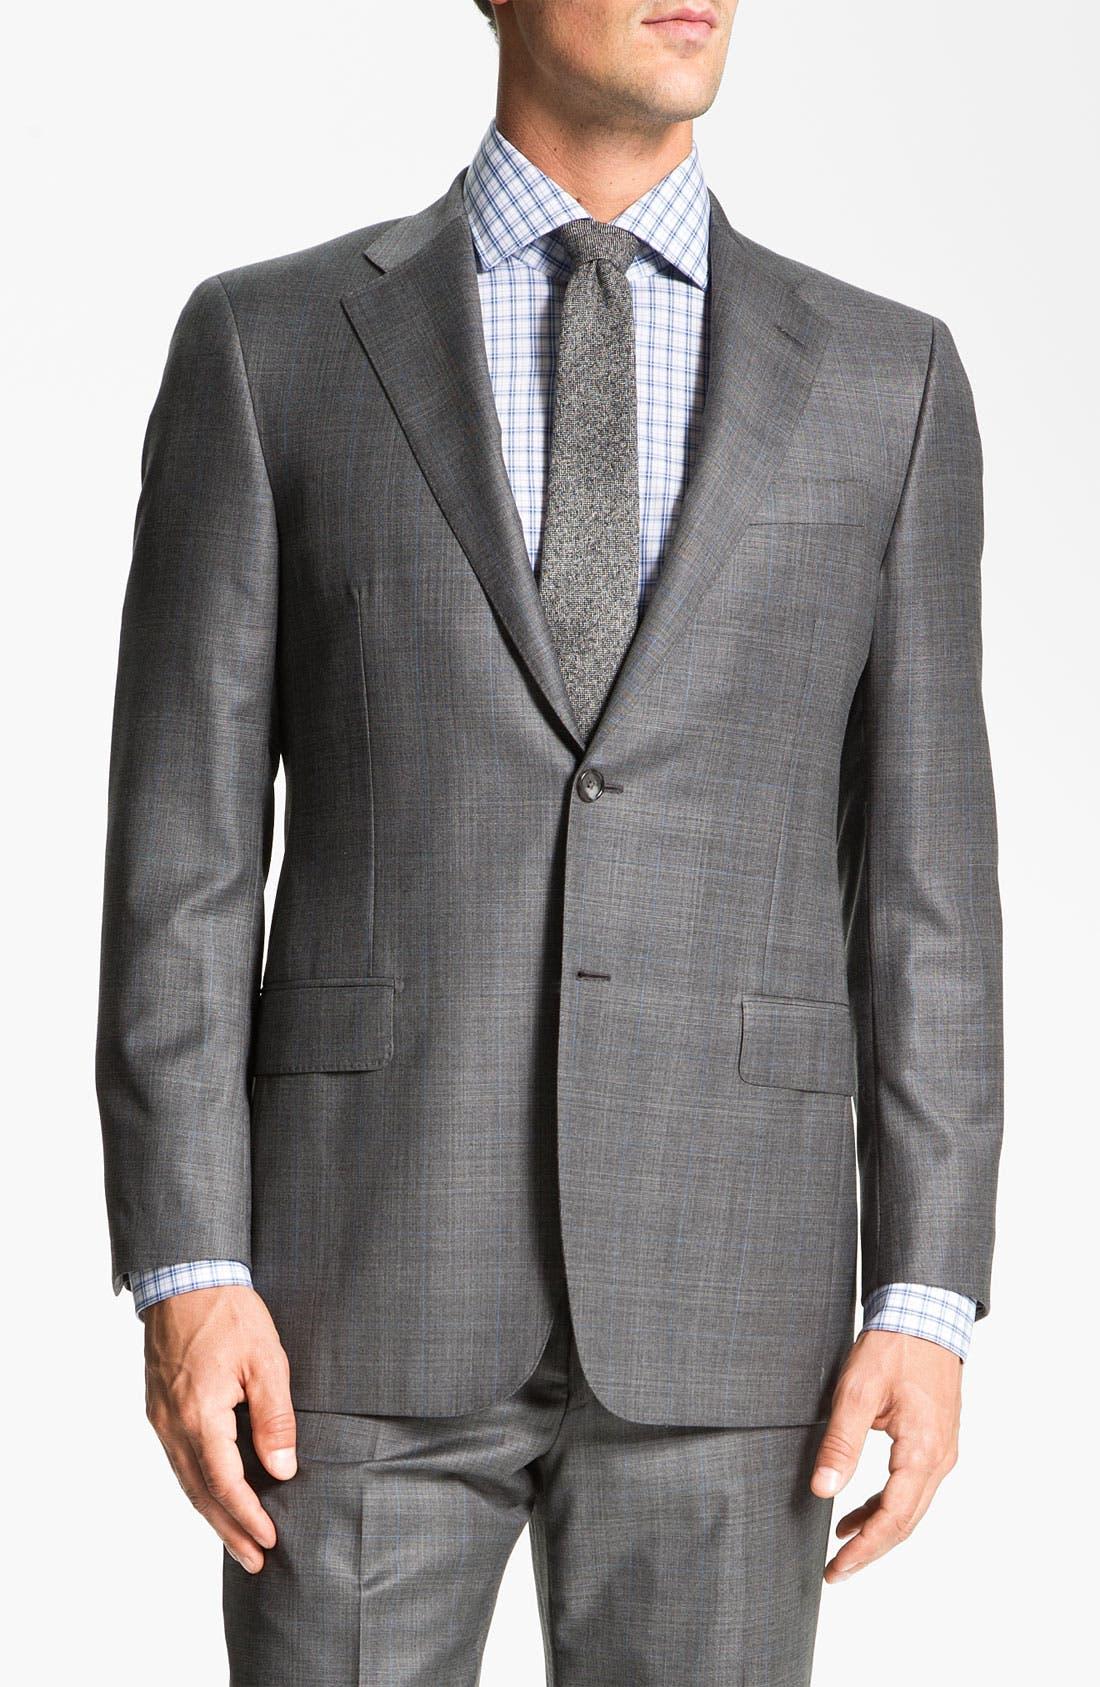 Main Image - Hickey Freeman 'B Series' Wool Suit